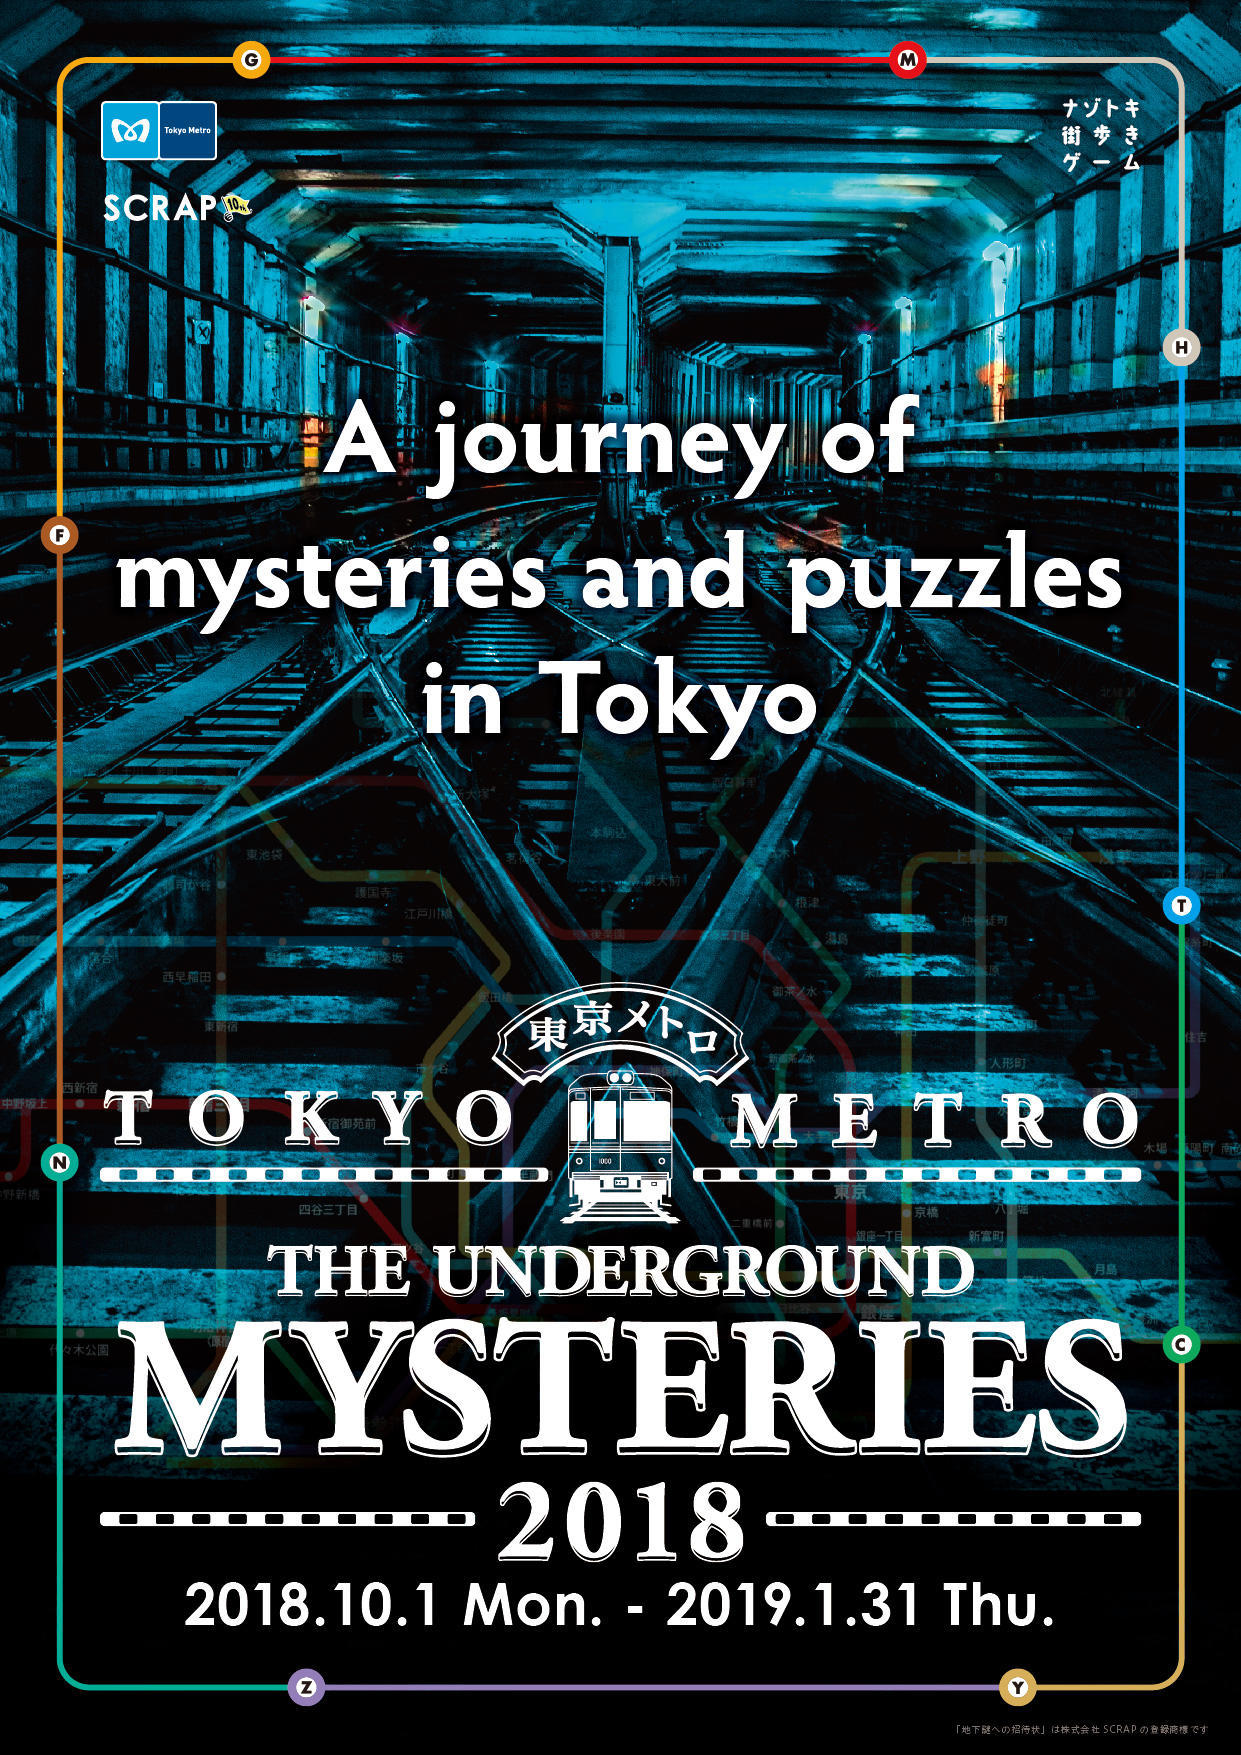 [PAST] TOKYO METRO The Underground Mysteries 2018